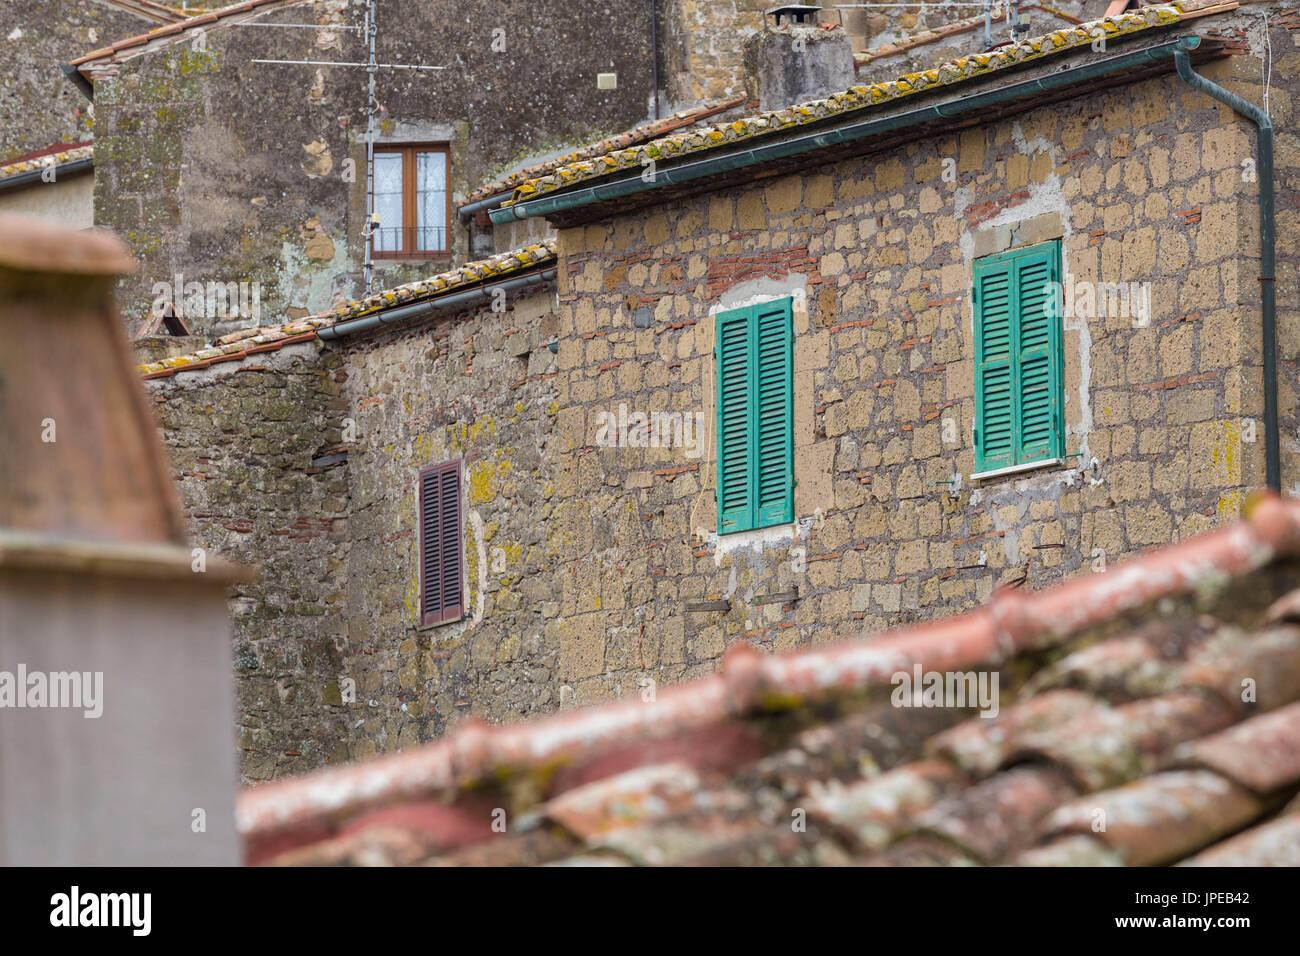 Detail of houses of Sorano. Sorano, Grosseto province, Tuscany, Italy, Europe - Stock Image